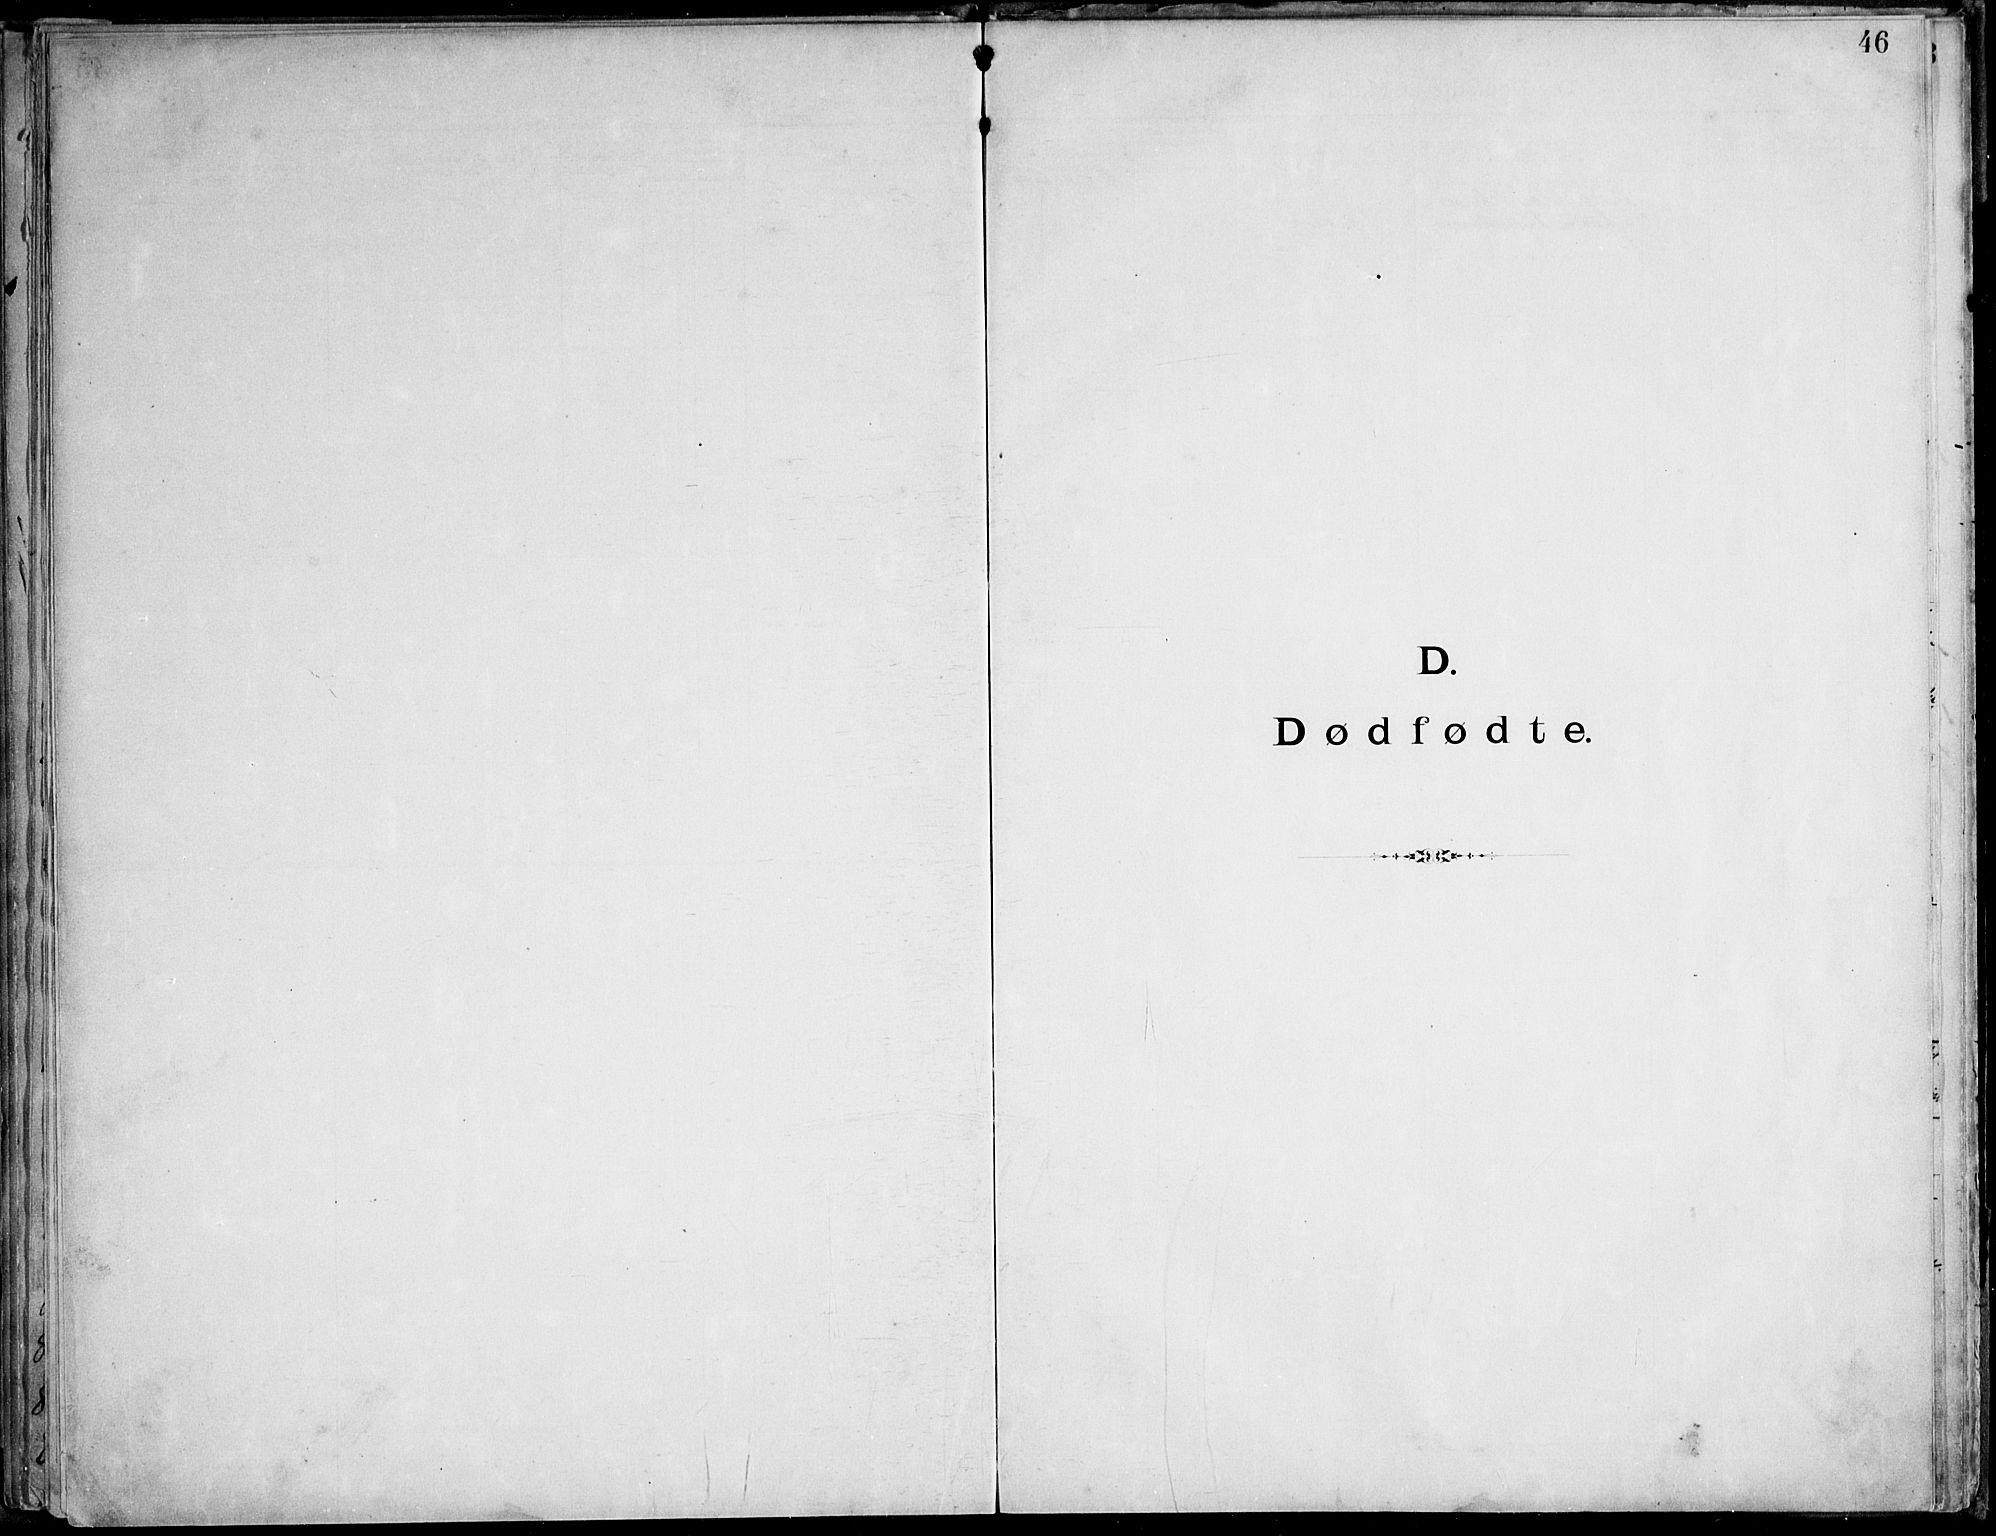 SAT, Ministerialprotokoller, klokkerbøker og fødselsregistre - Nordland, 888/L1276: Dissenter register no. 888D03, 1893-1944, p. 46